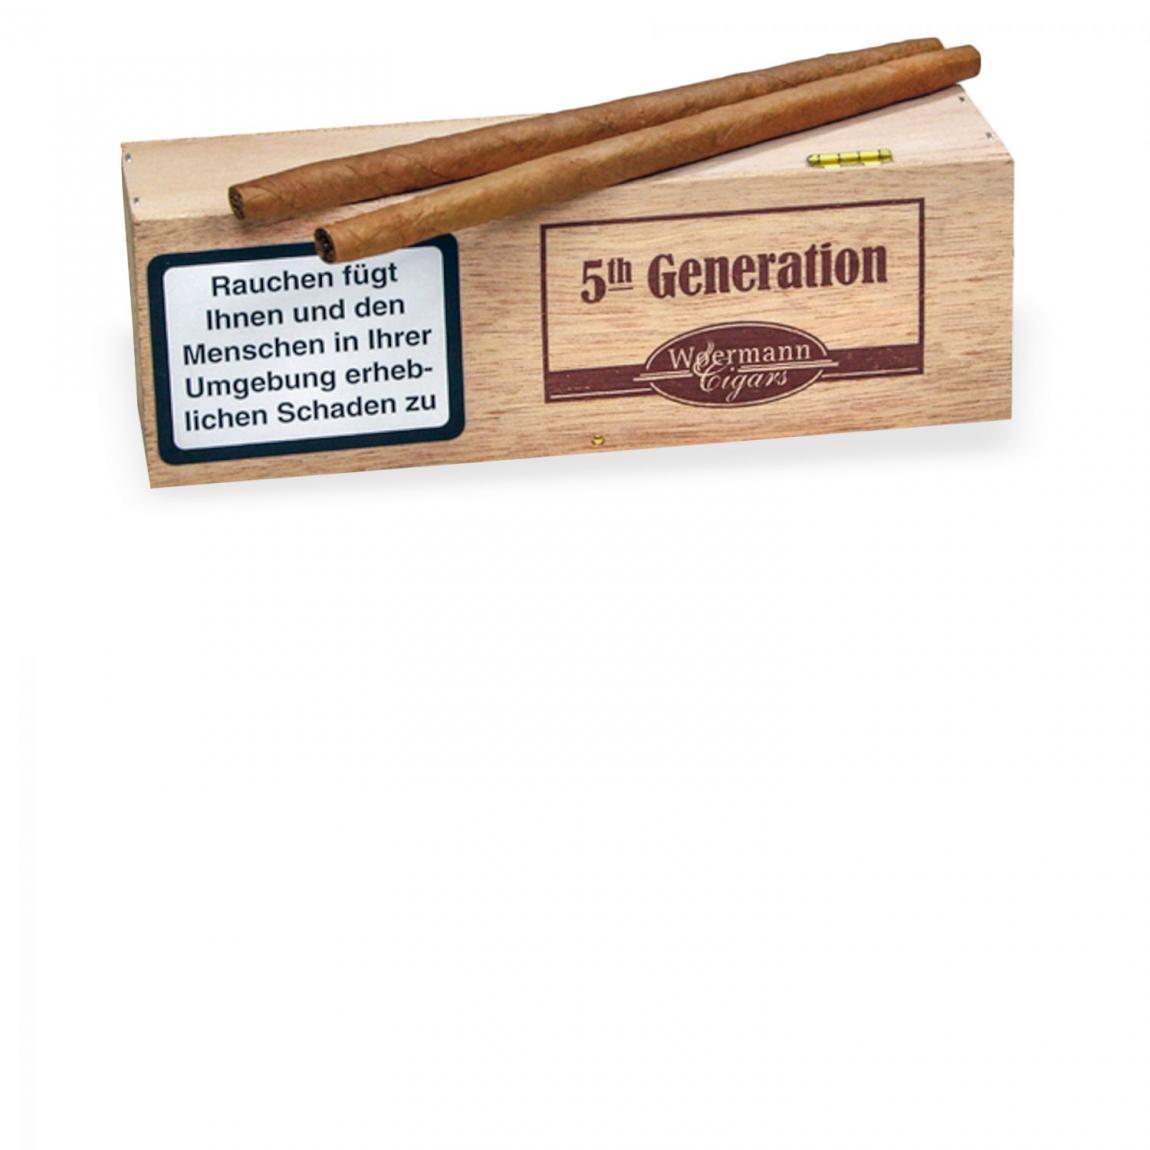 5th Generation »Long Cigarillo Sumatra« 25er Kiste